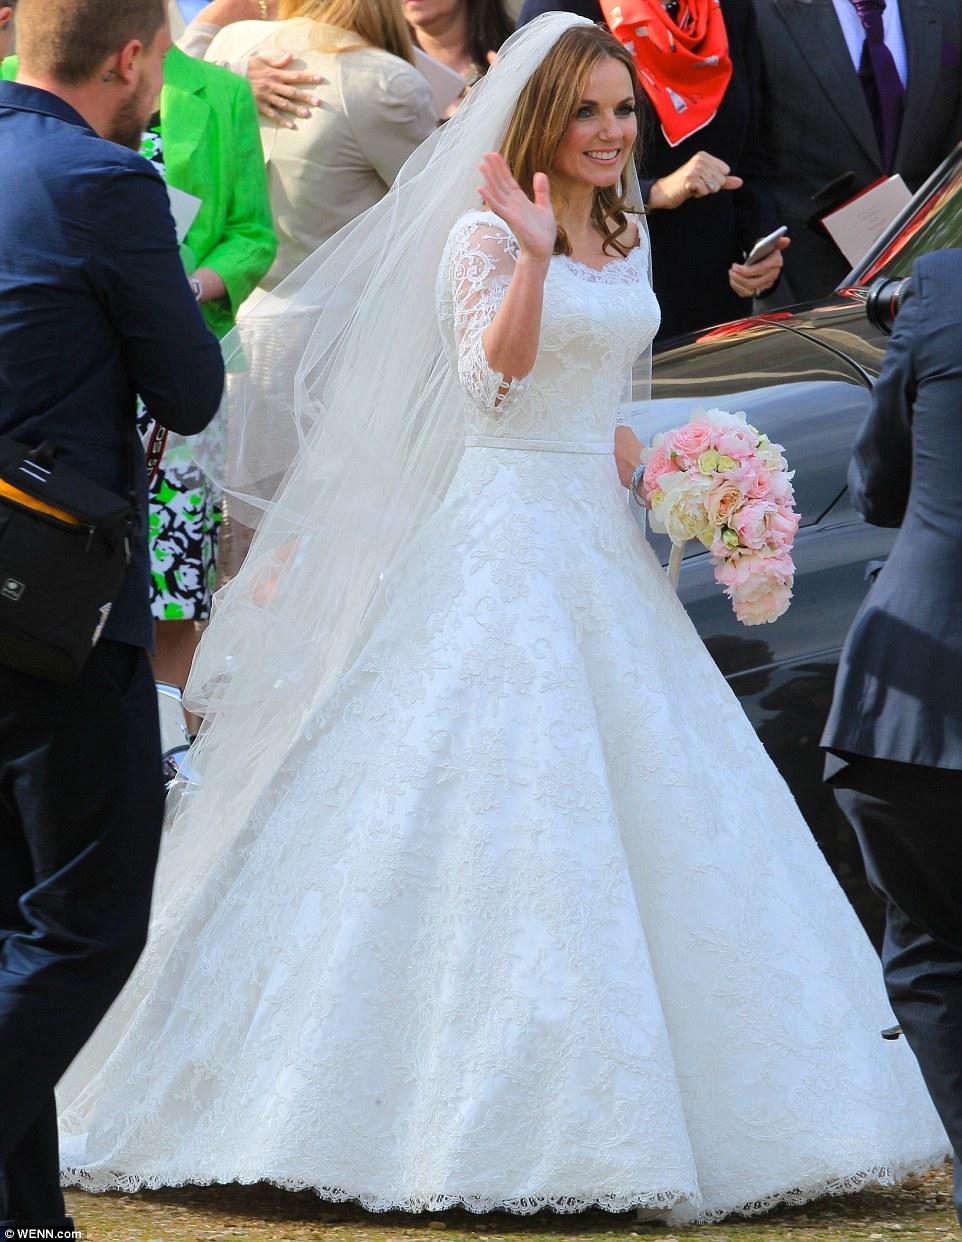 christian wedding dresses 2017-2018 - white wedding gowns